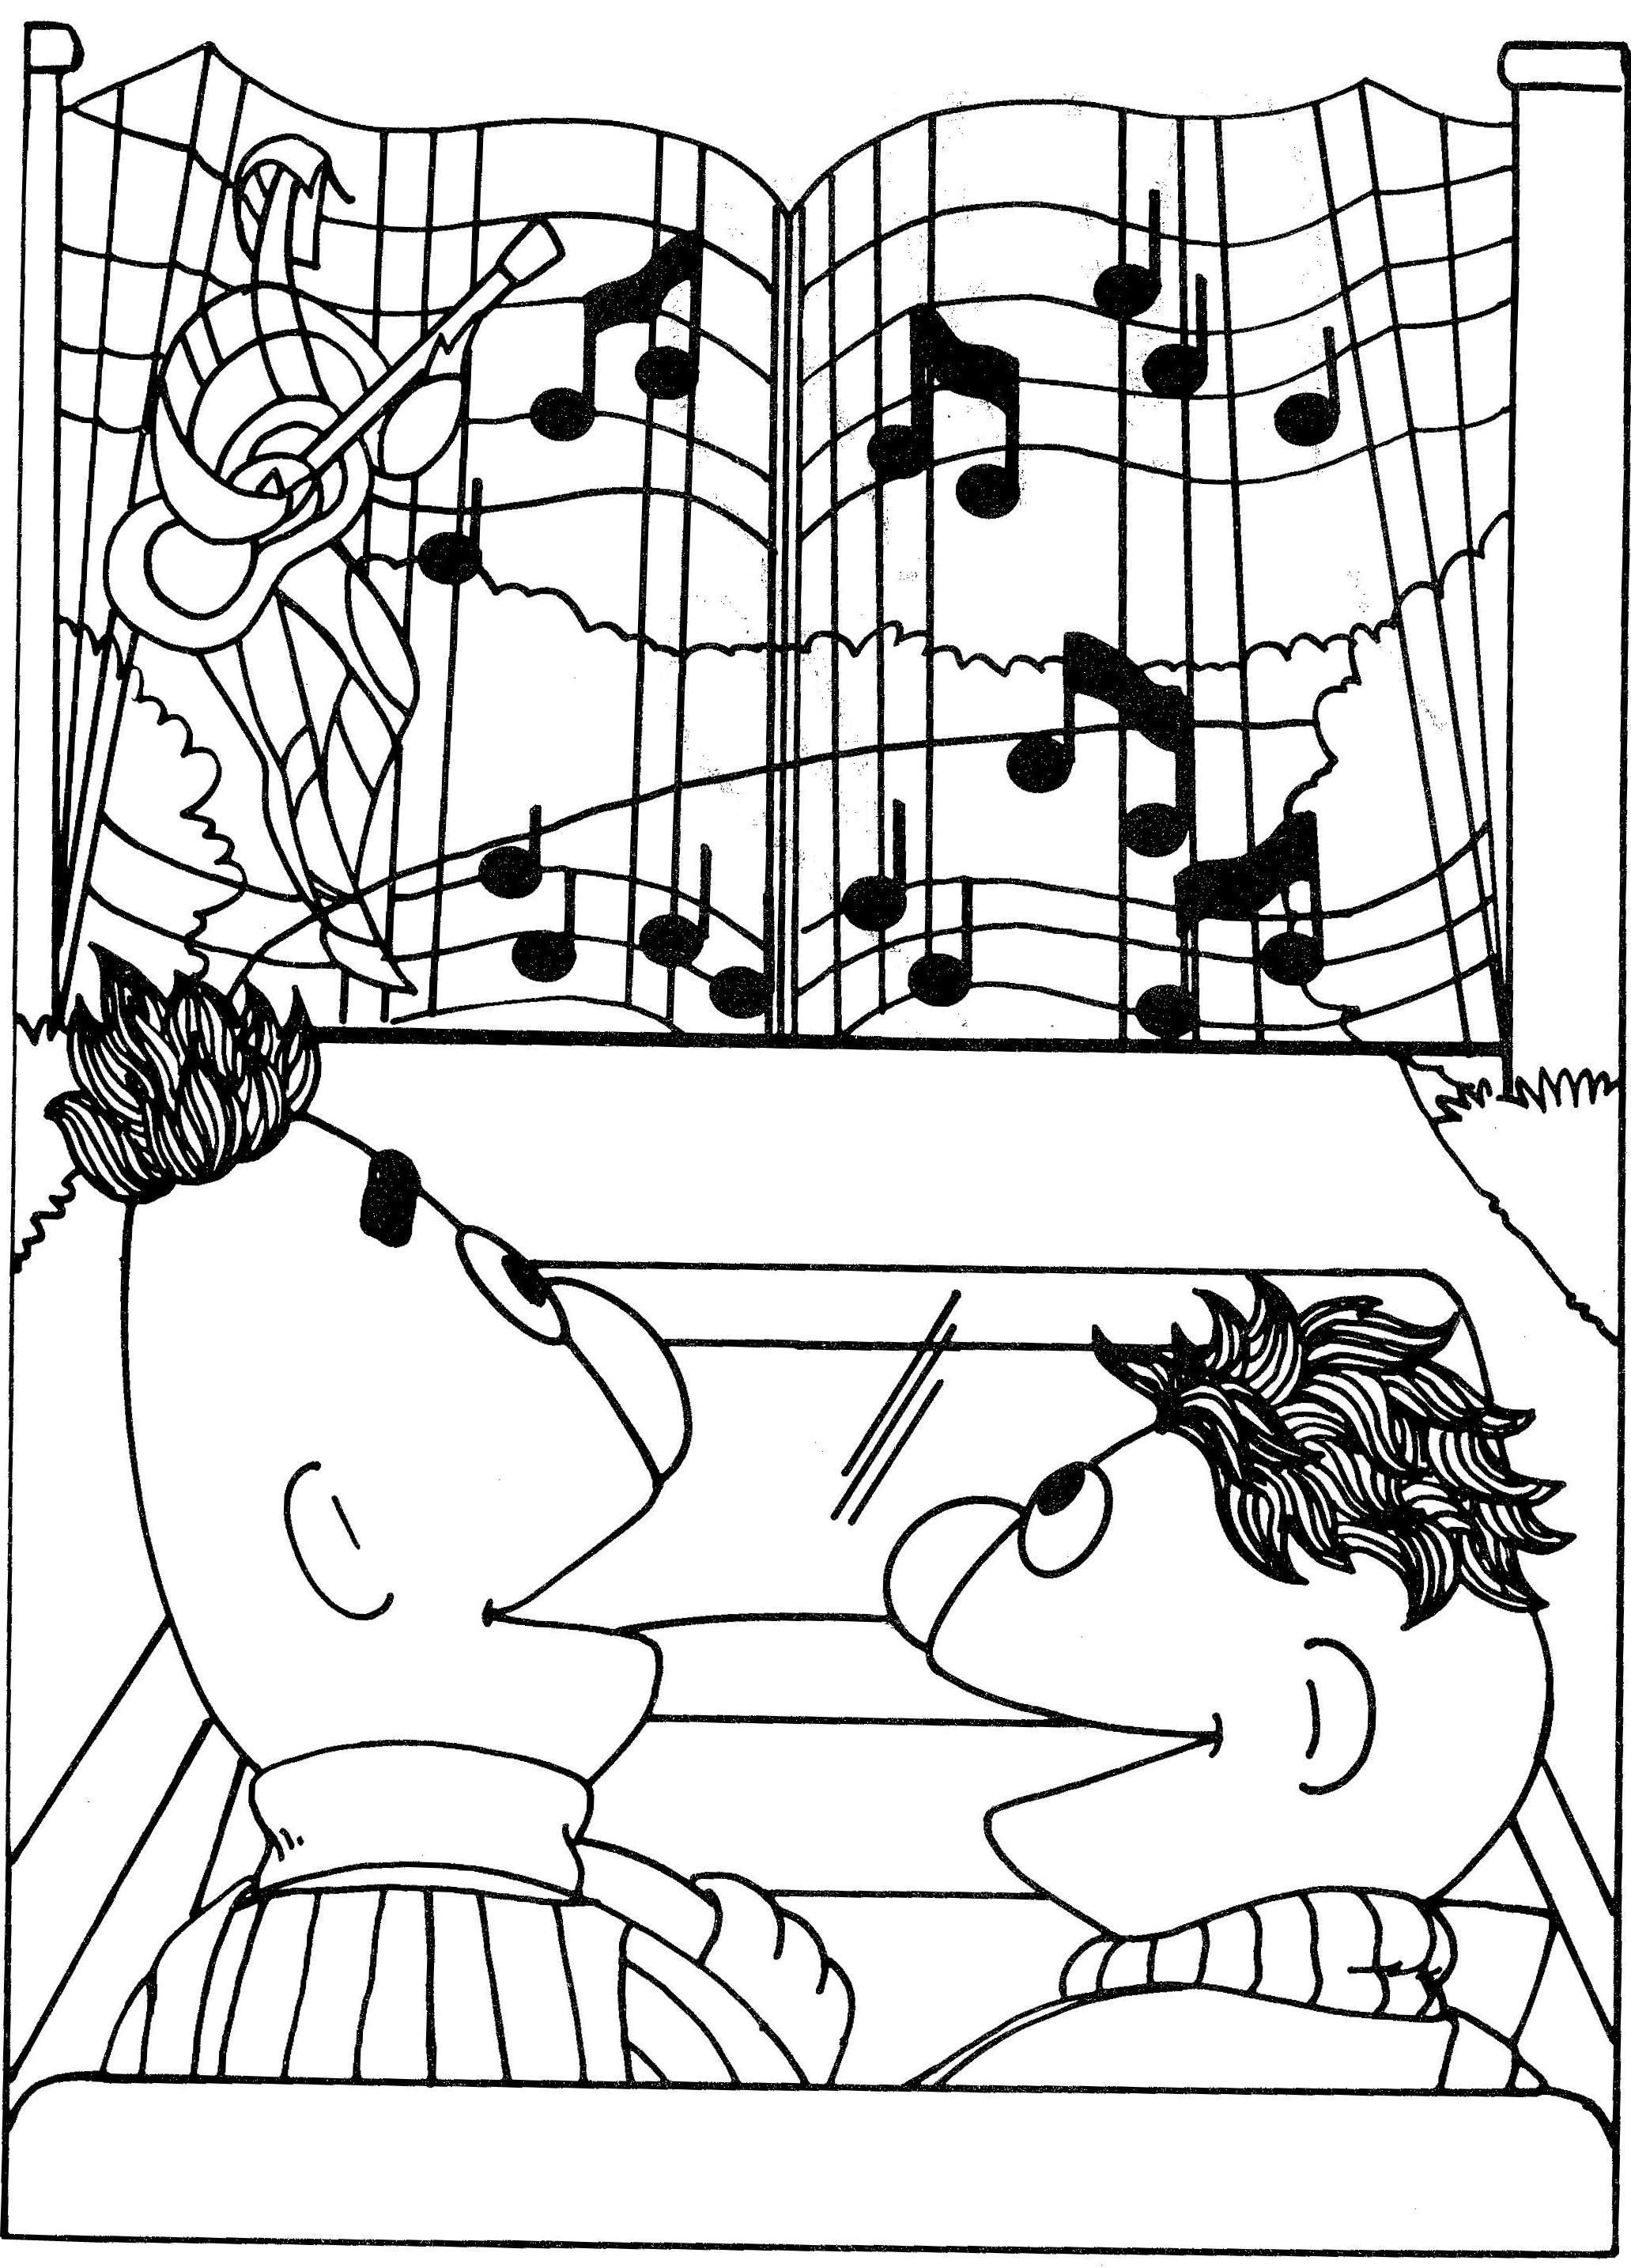 memphis coloring pages - photo#35